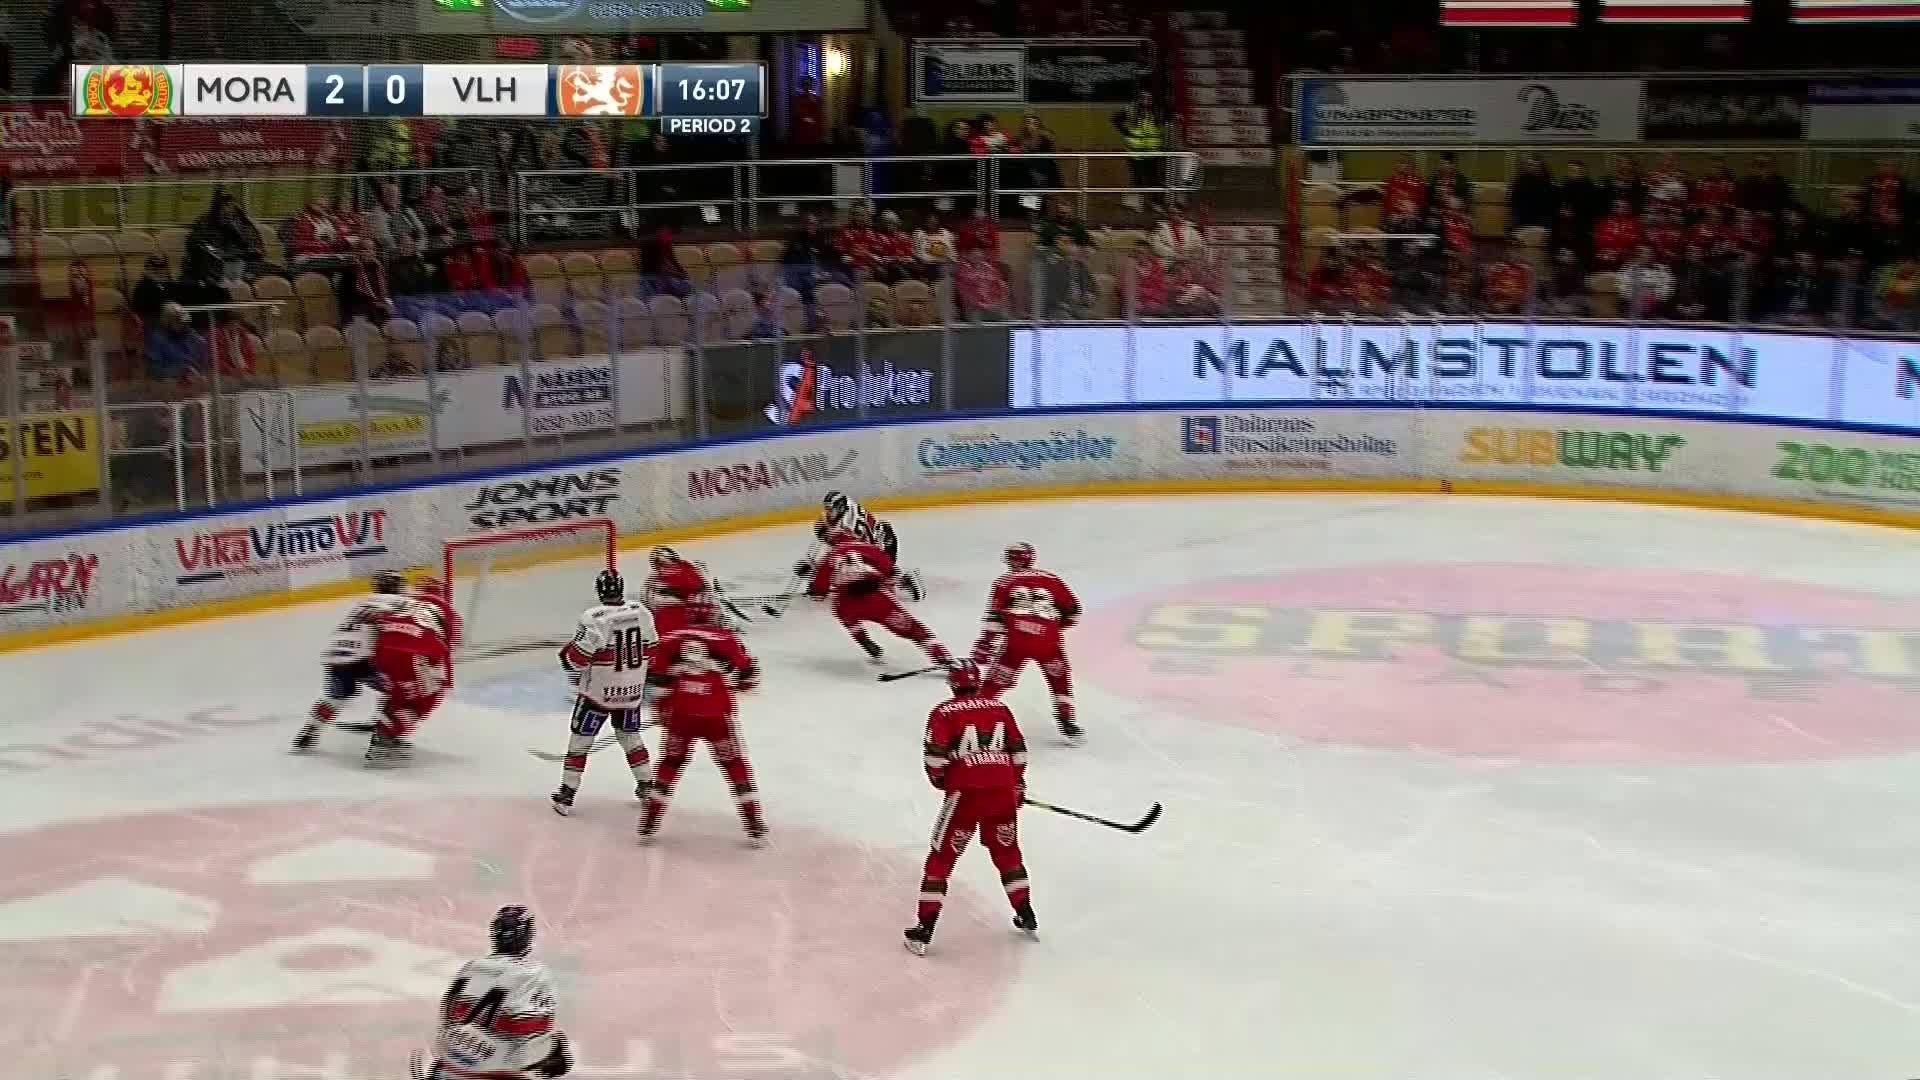 Mora IK - Växjö Lakers 2-1